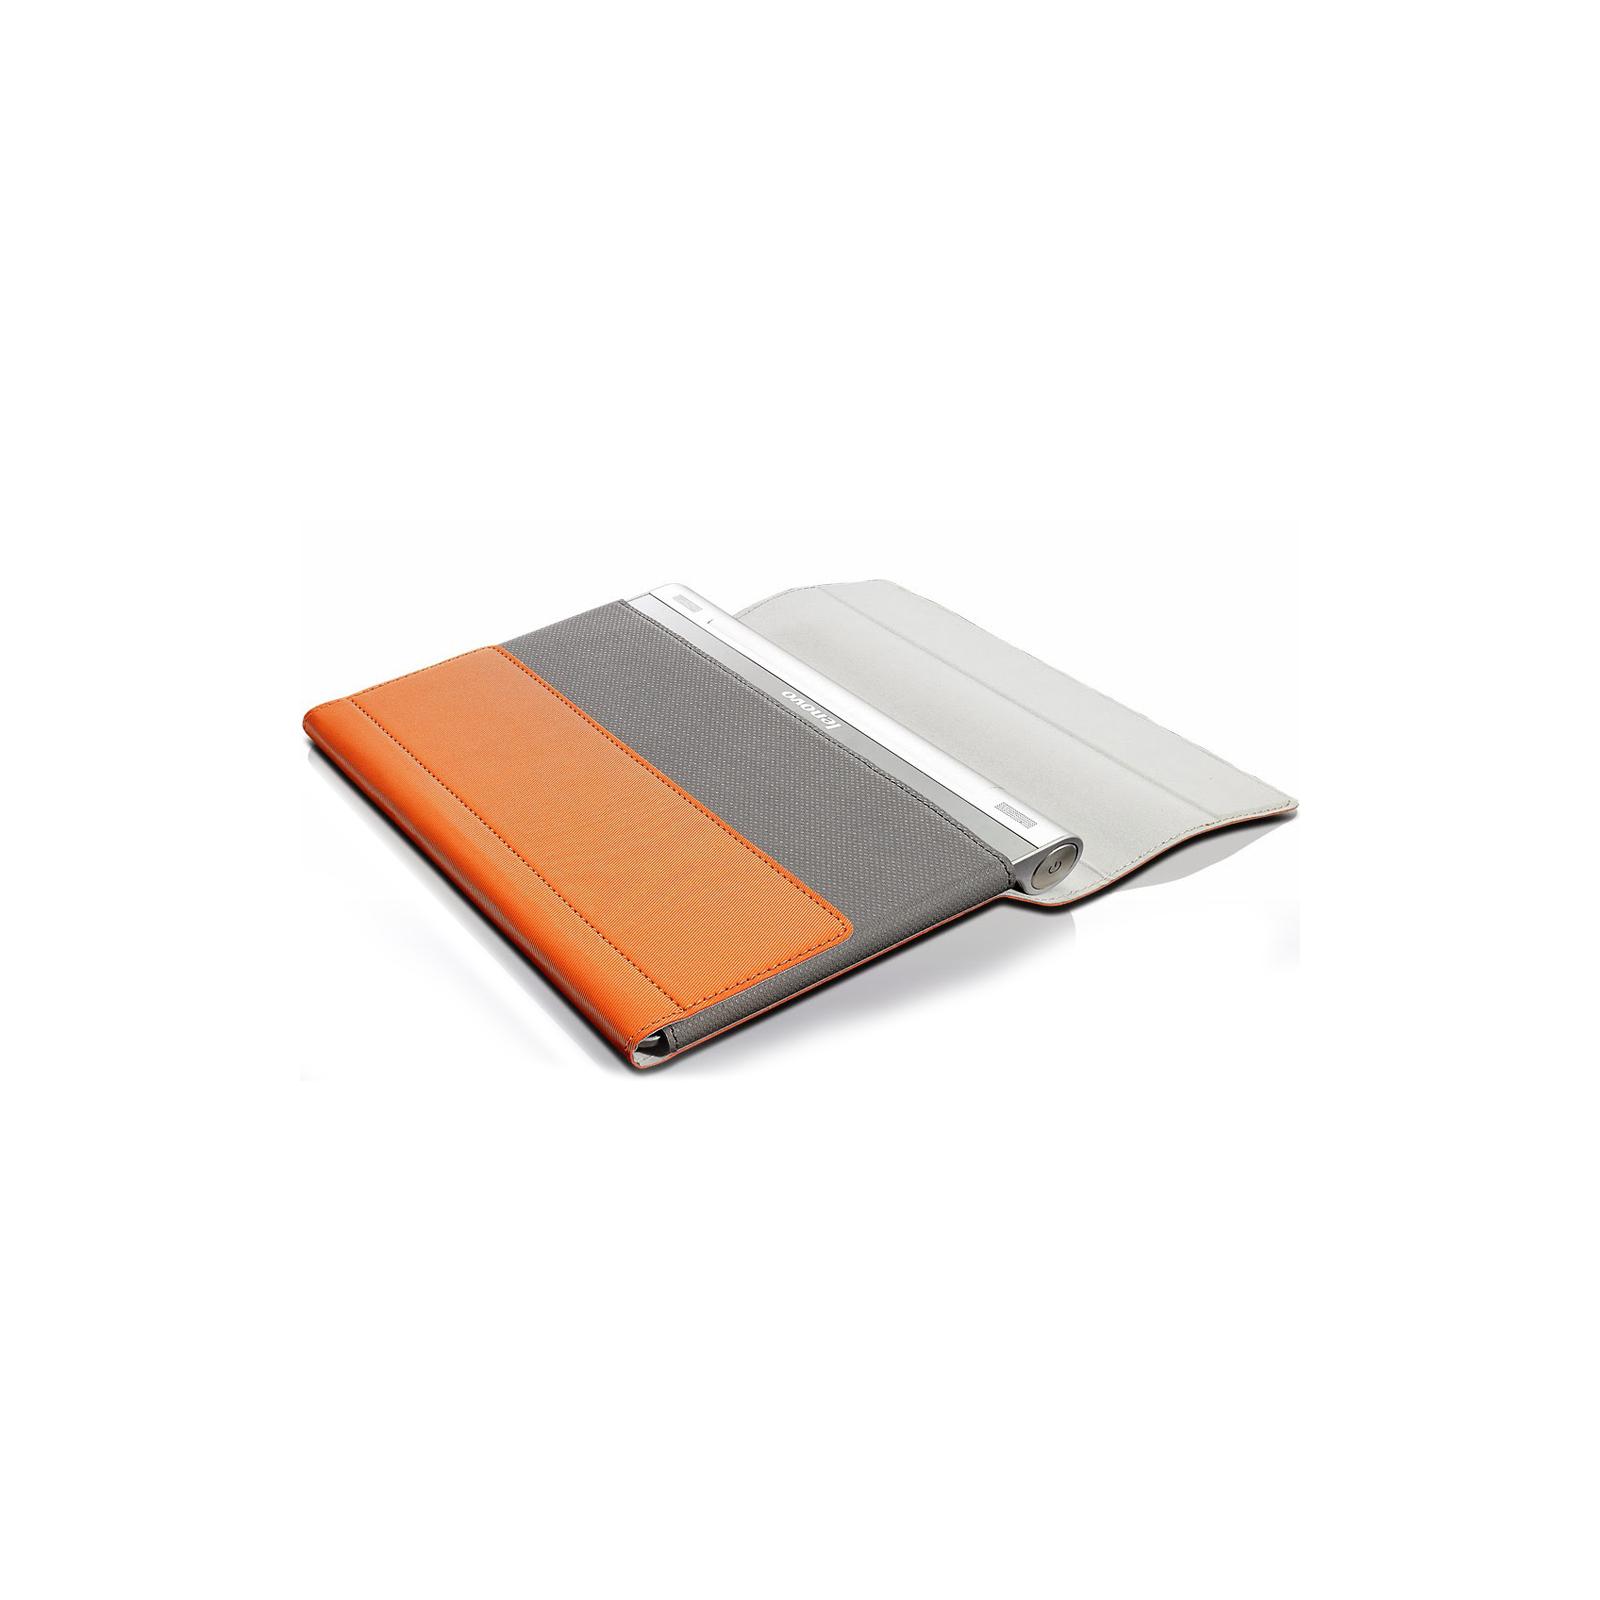 Чехол для планшета Lenovo 8' B6000 Yoga Tablet, Sleeve and Film Orange (888015977) изображение 2